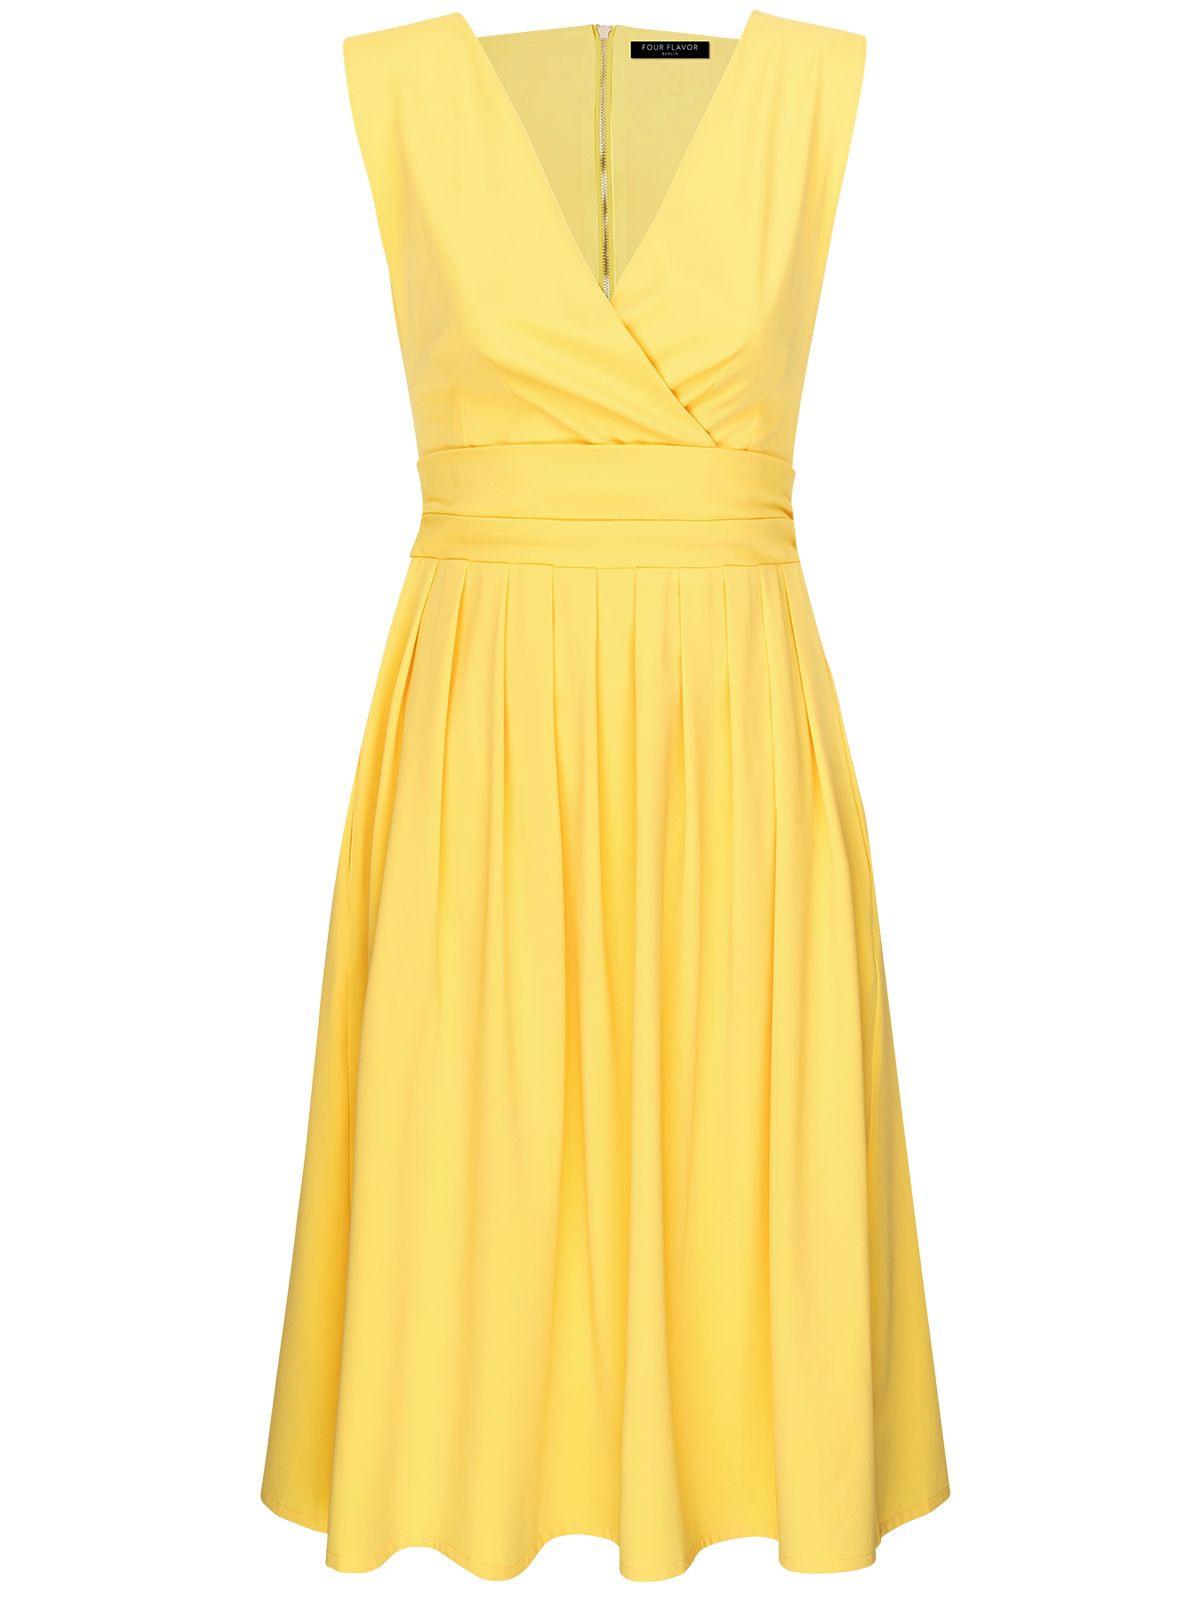 Classic Flavor Aboutyoude Ladlylike Kleid Mit Leicht